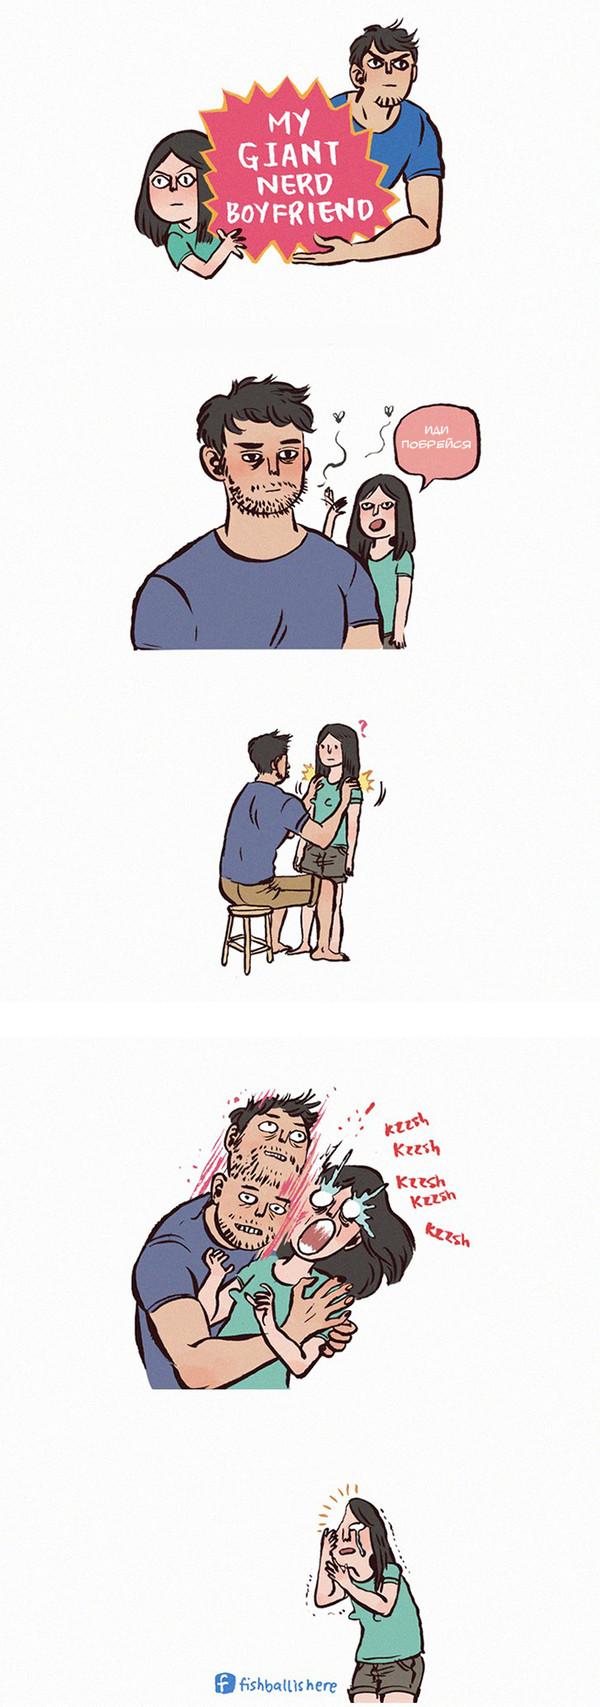 Щетина Комиксы, webcomics, щетина, бритье, My Giant Nerd Boyfriend, длиннопост